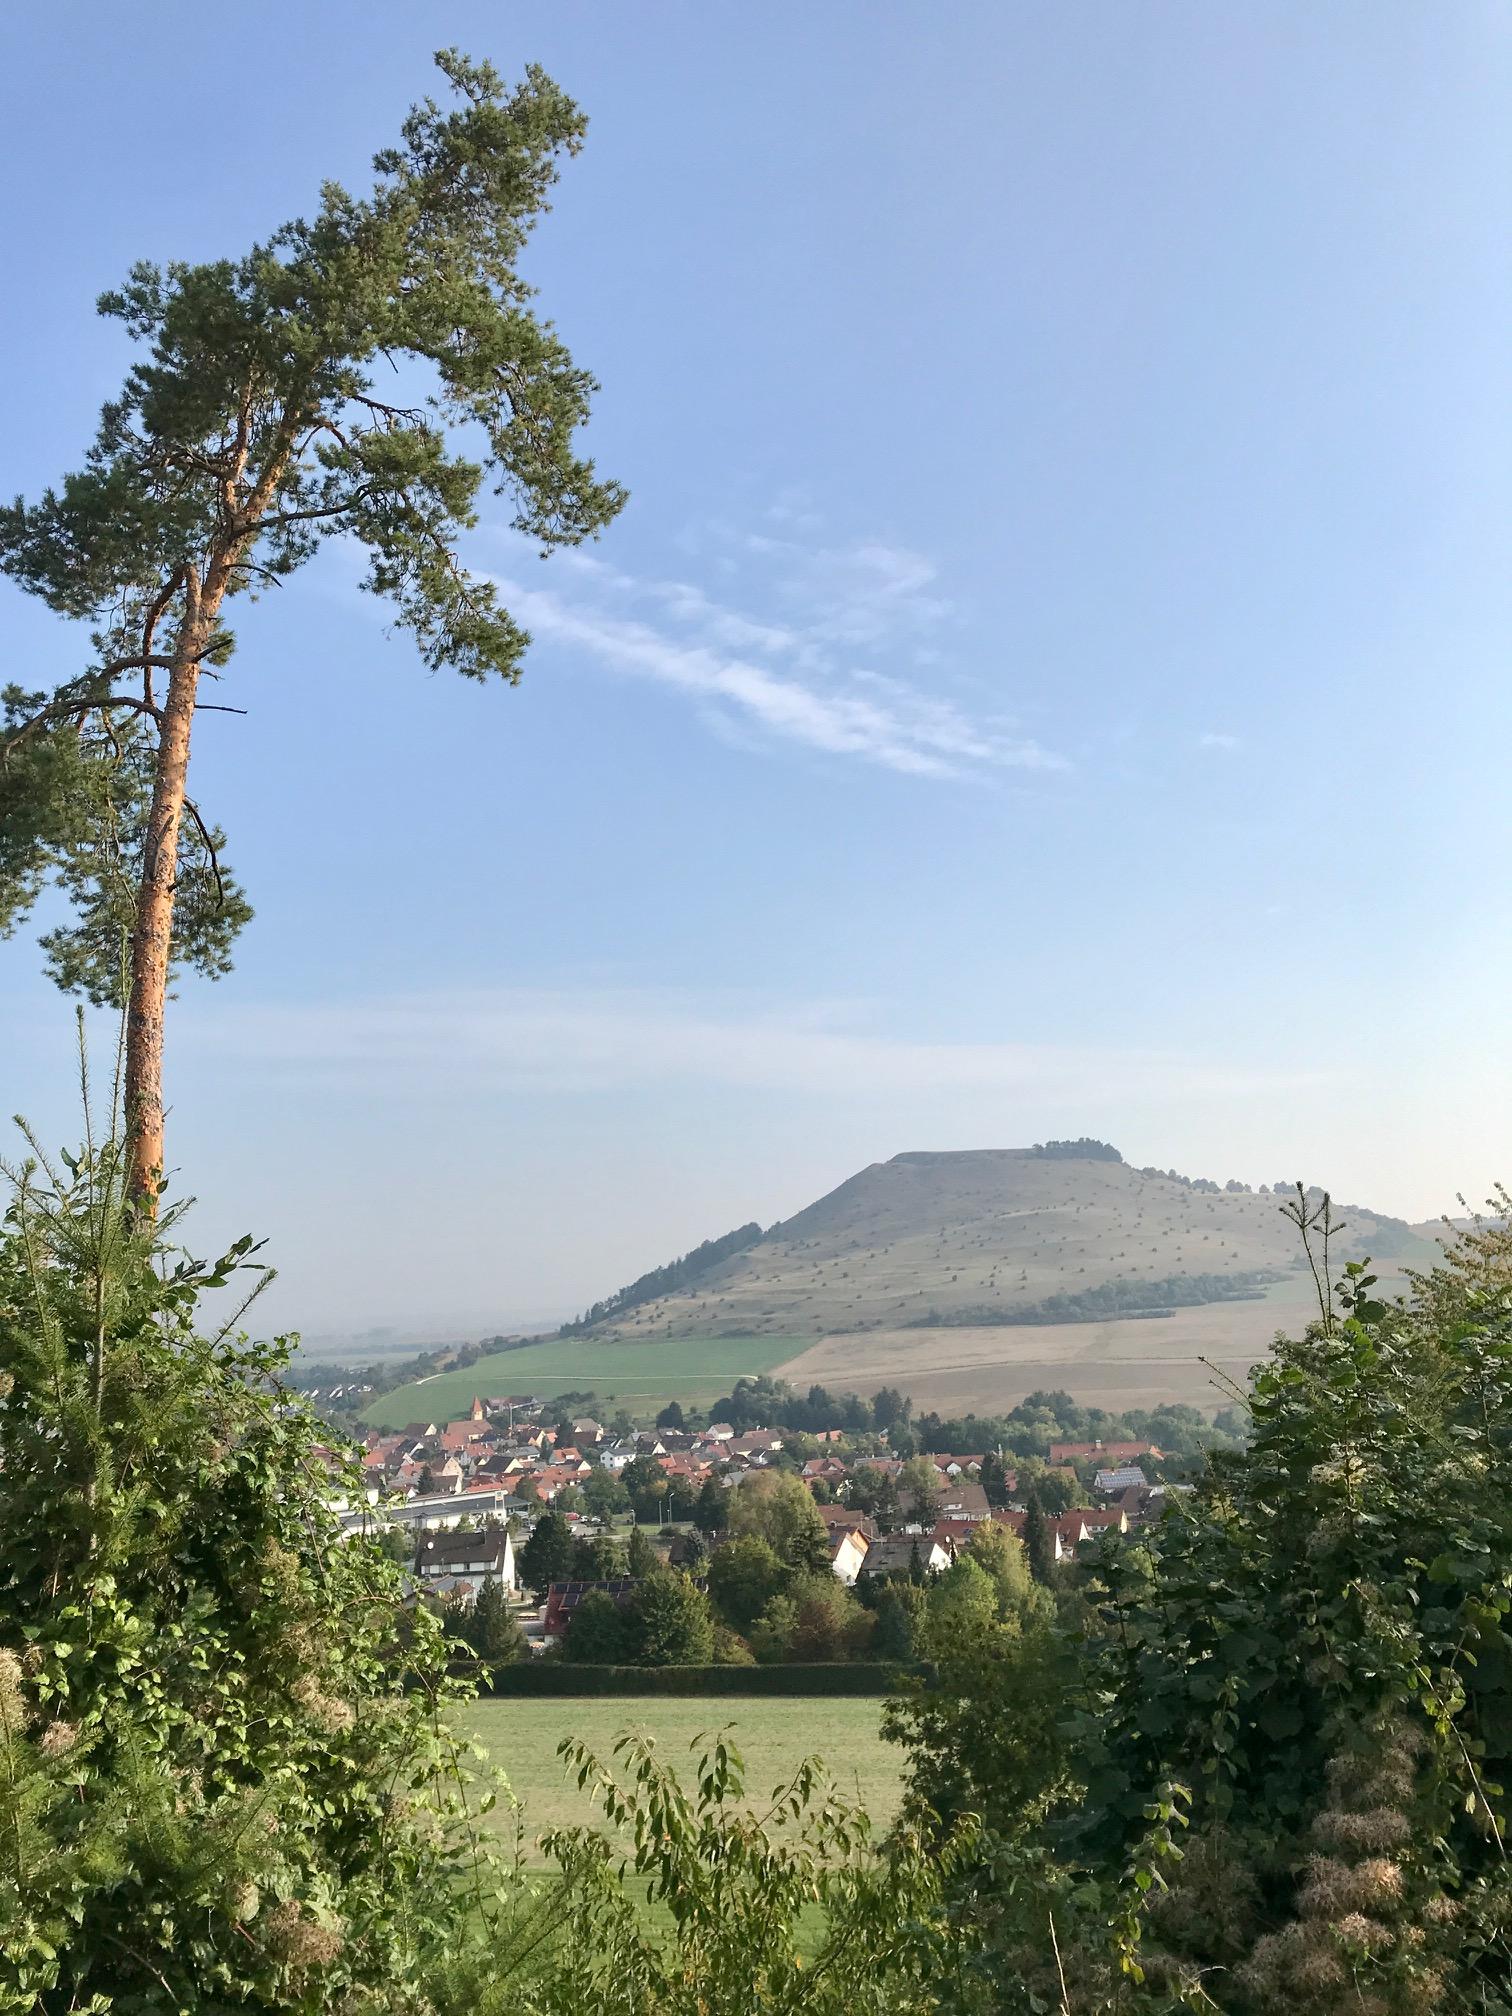 Blick auf den Ipf. Albsteig, Etappe 3 hinter Bopfingen